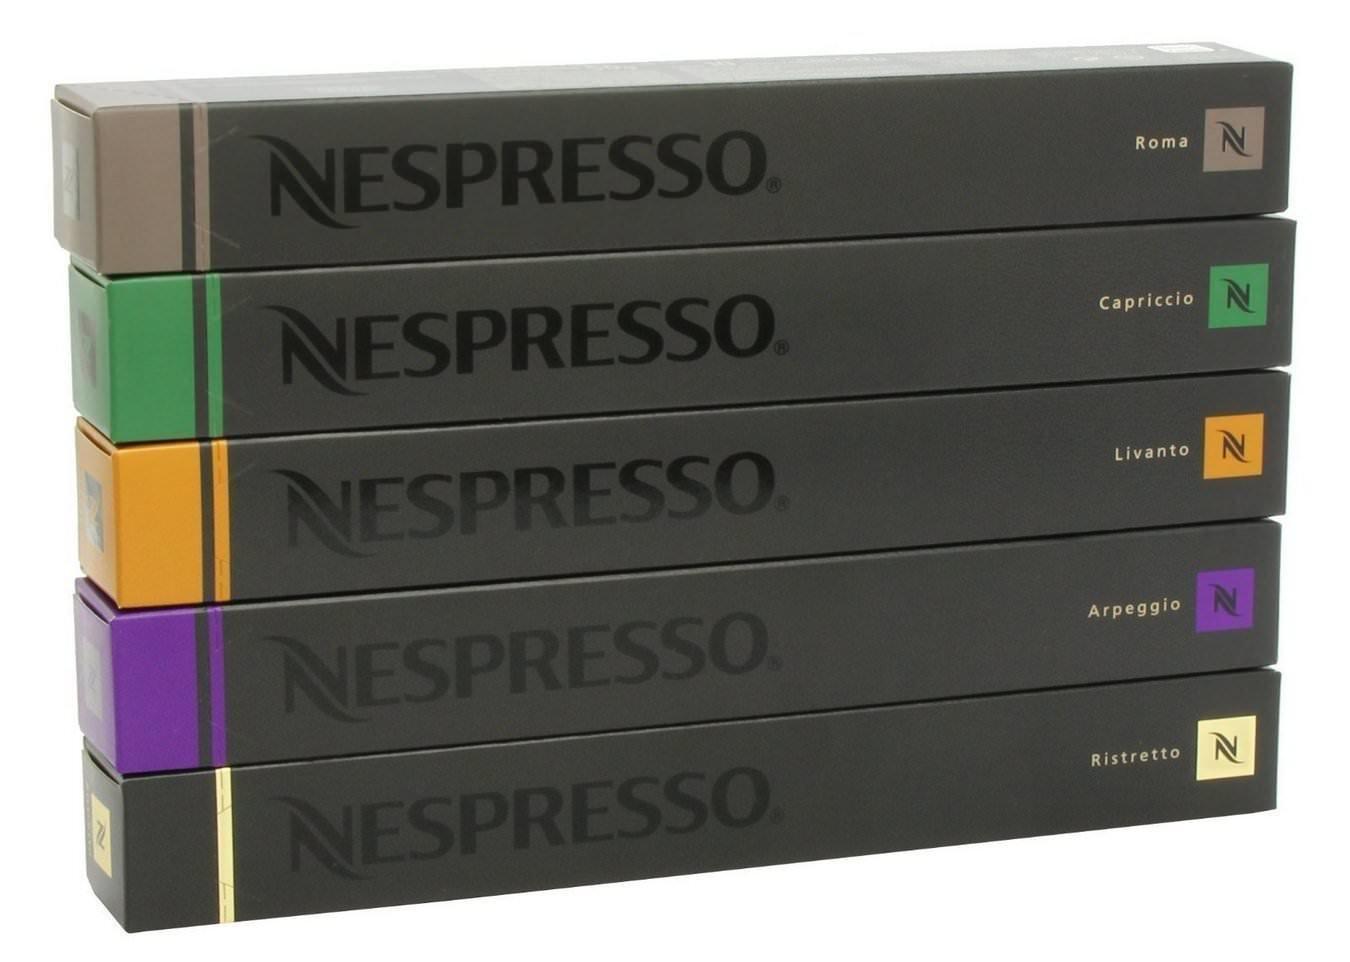 Nestle Nespresso Variety Pack for OriginalLine, 50 Capsules